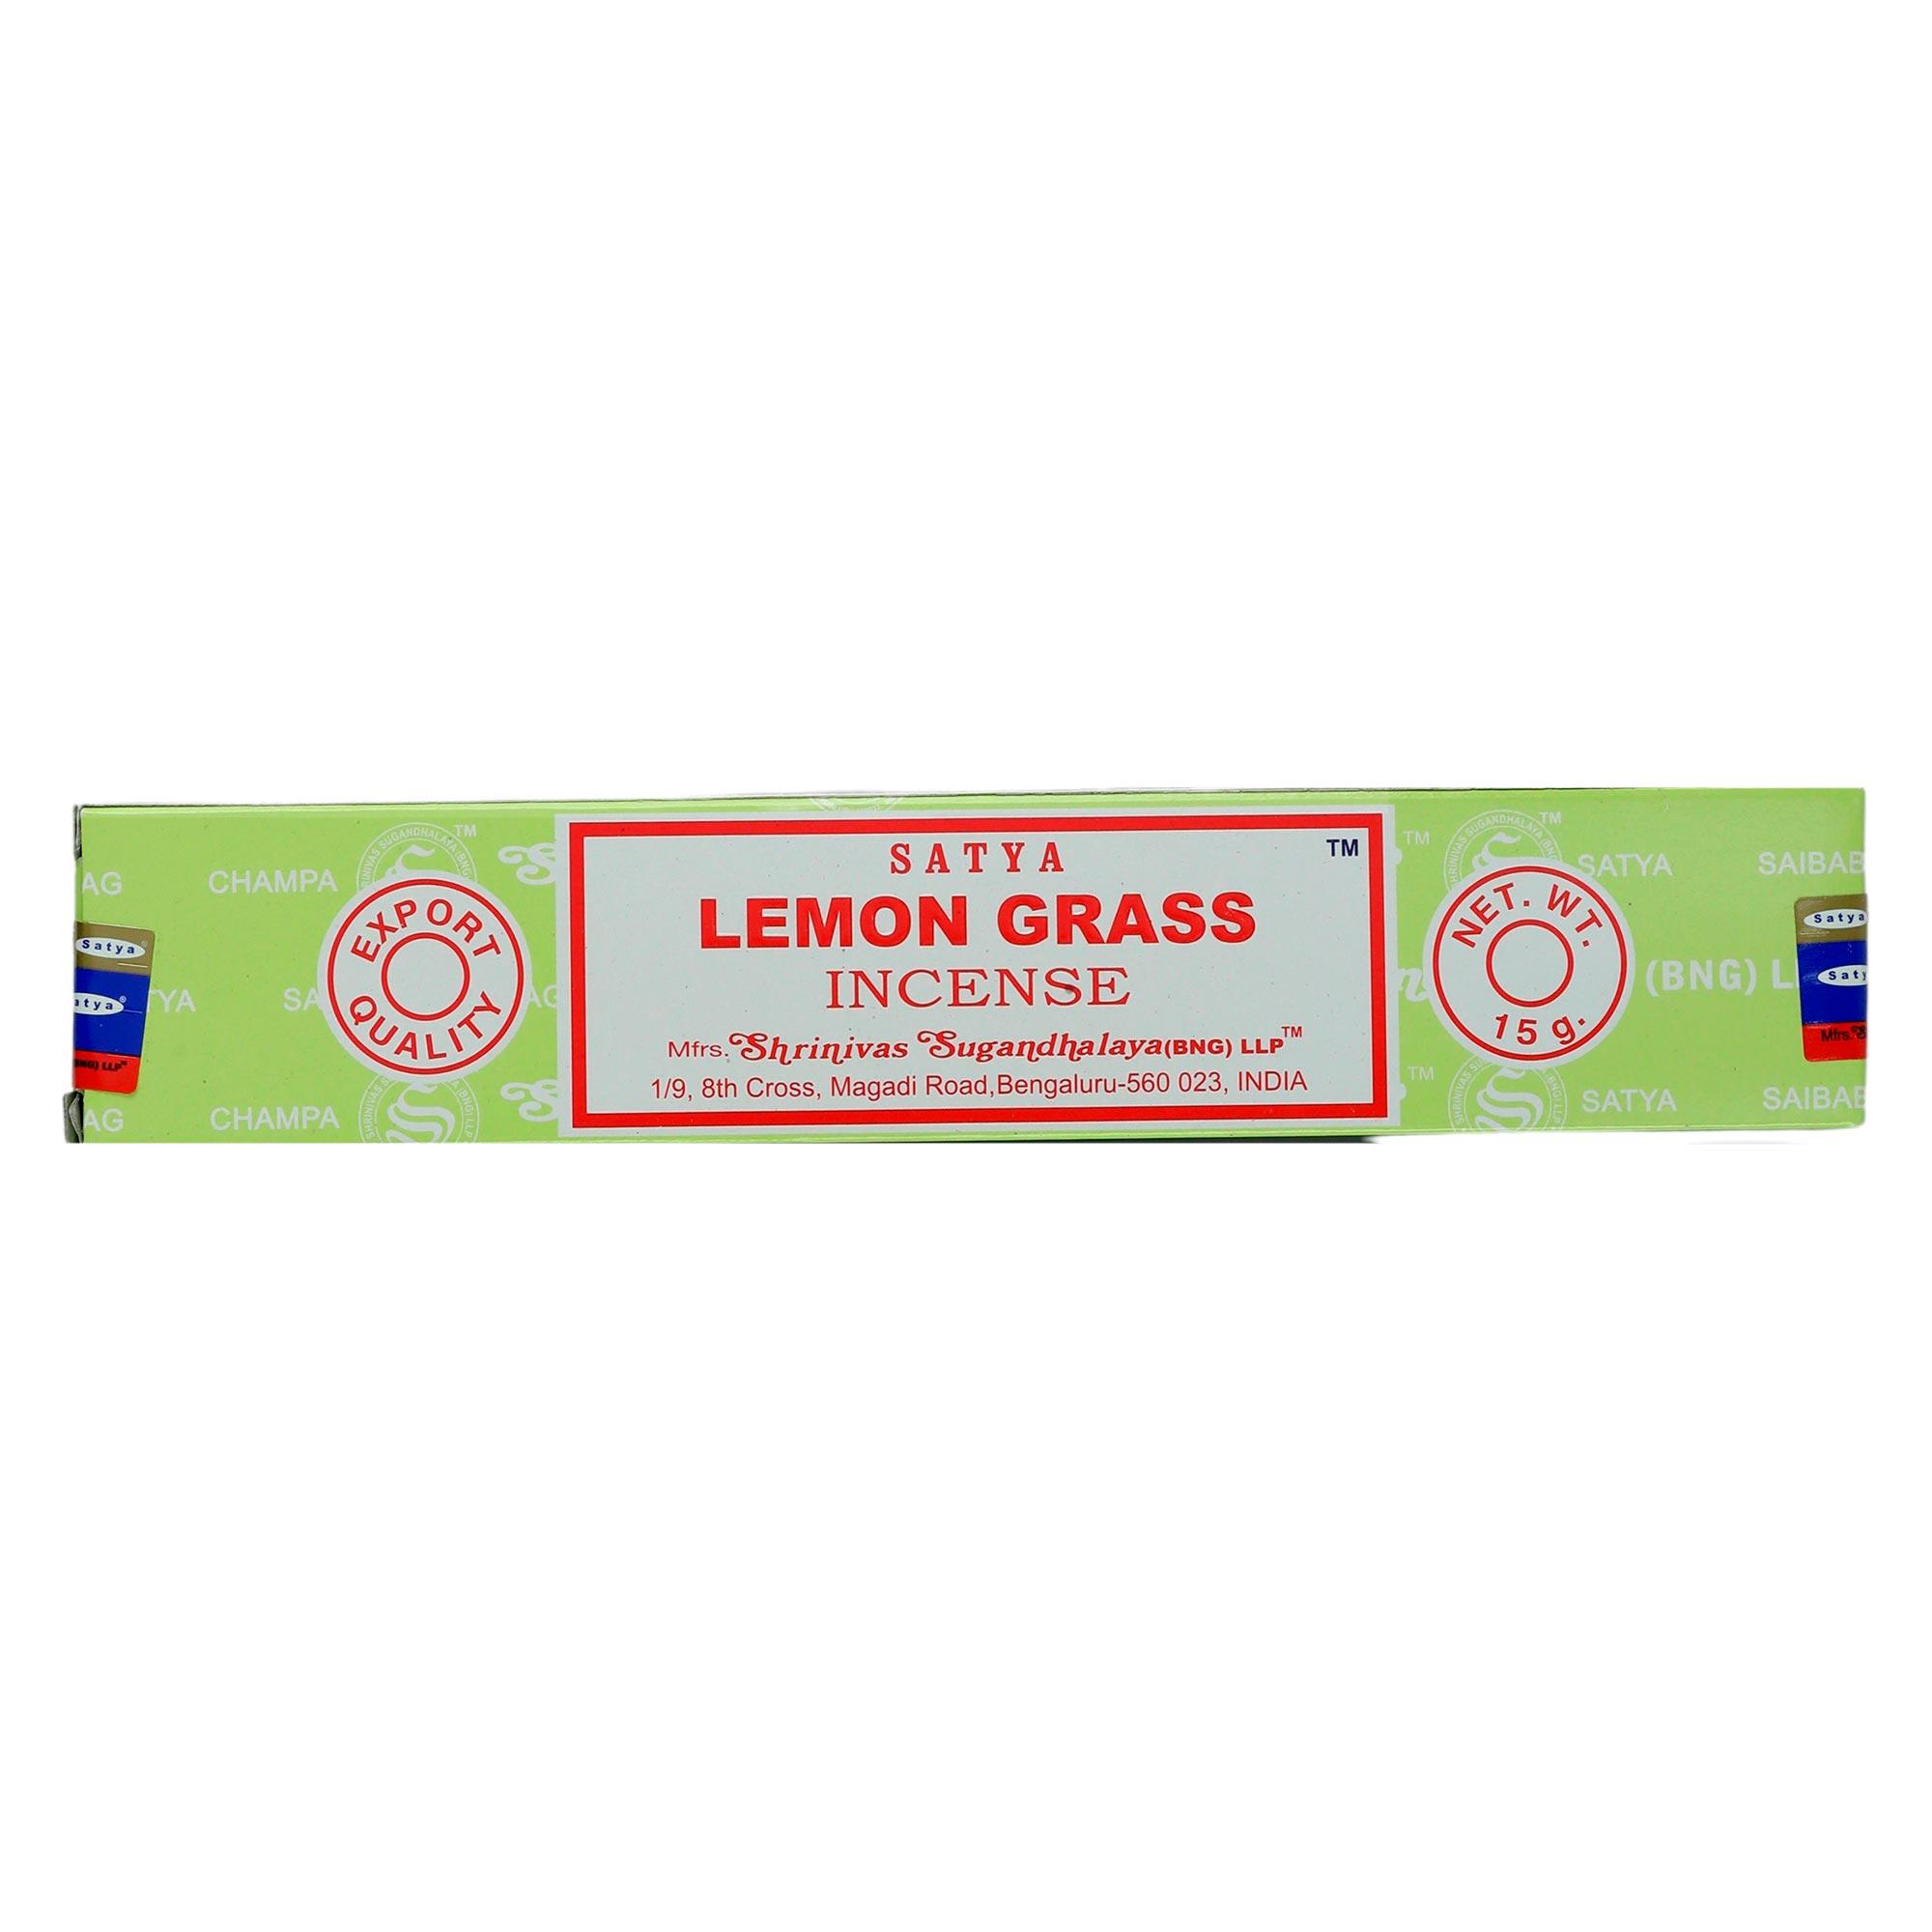 Incenso Nag Champa 15 g ( aromas diversos)